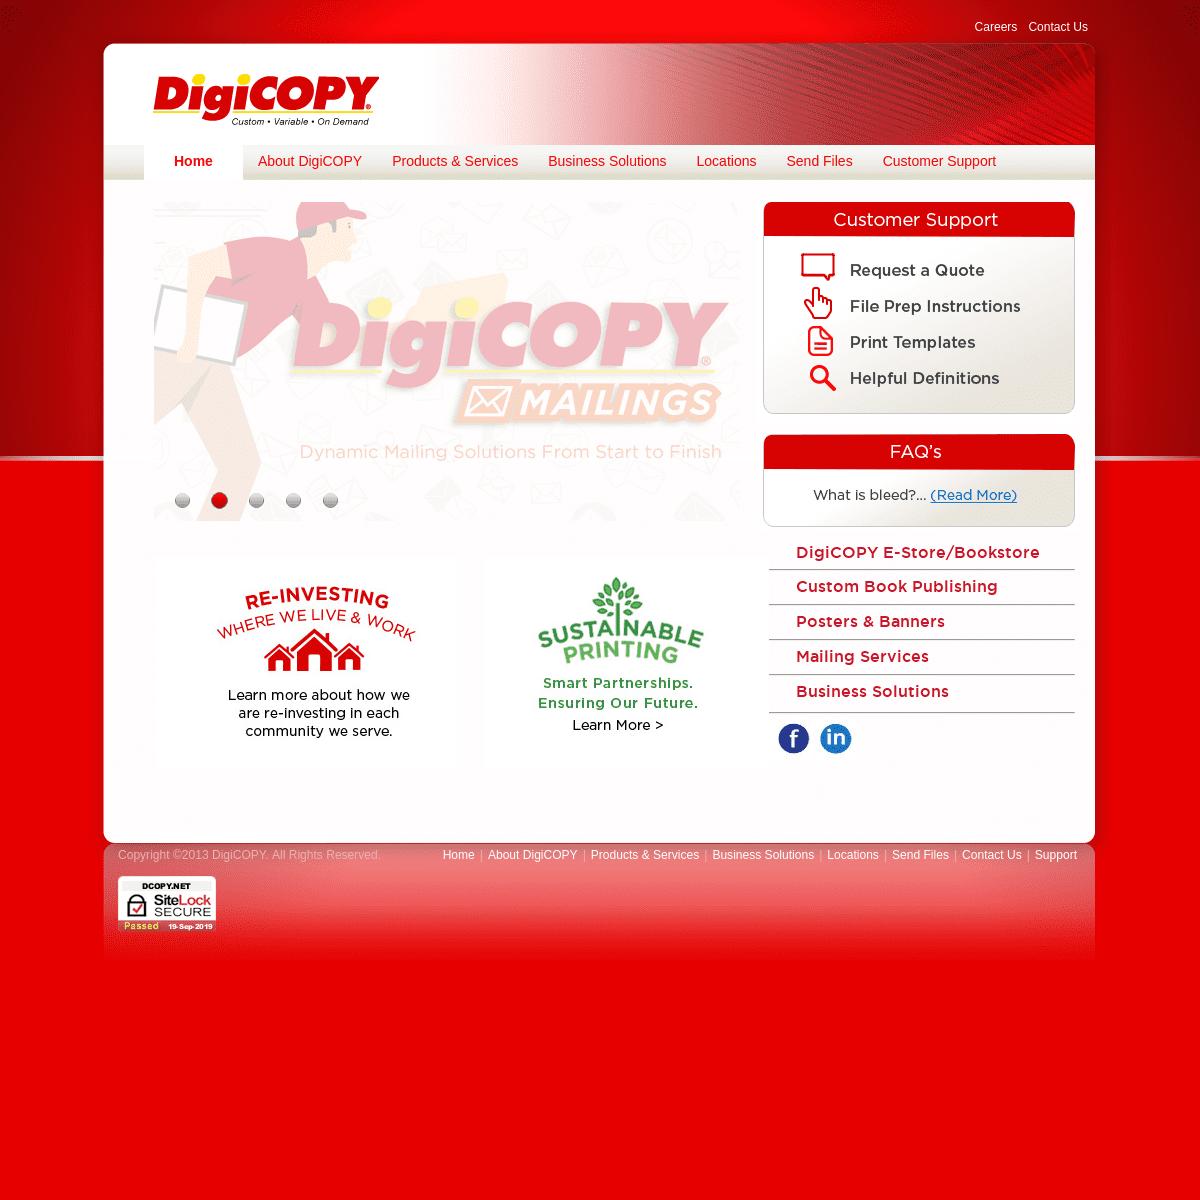 On Demand Digital Printing in Wisconsin - DigiCOPY